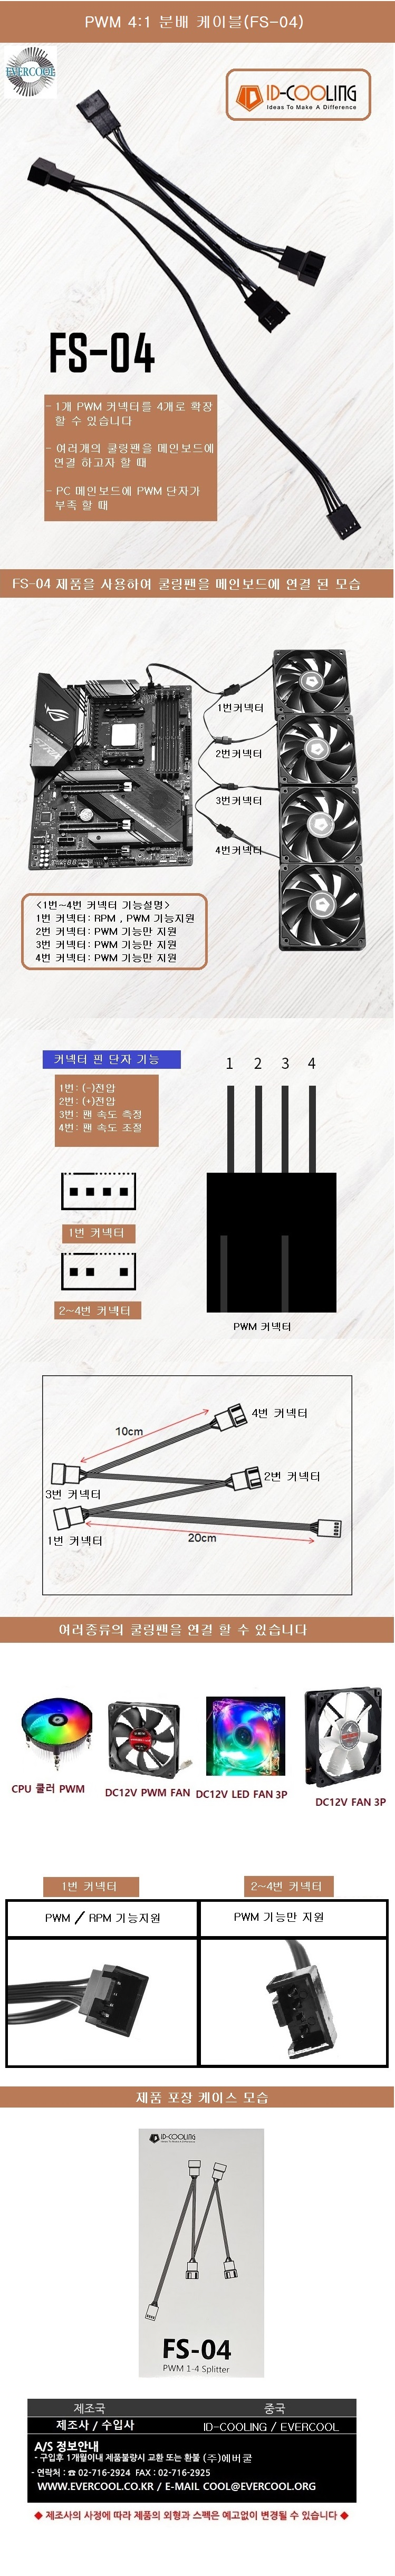 EVERCOOL FS-04 PWM 4:1 분배 케이블 (0.2m)